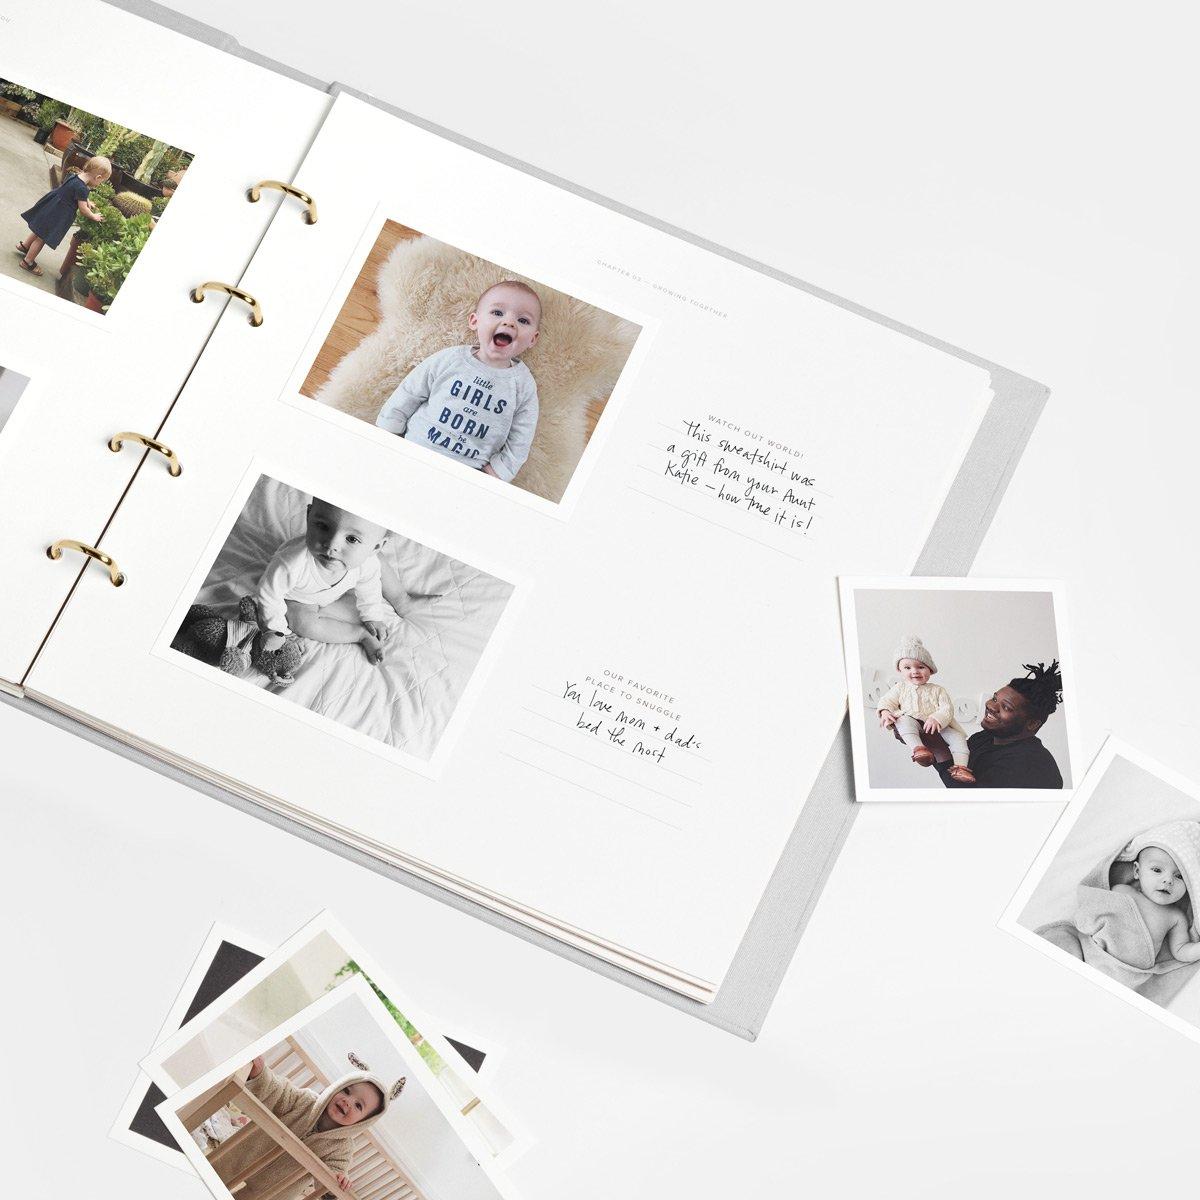 Making Memories Memory Book Scrapbook Album Gift Keepsake Present birthday Baby